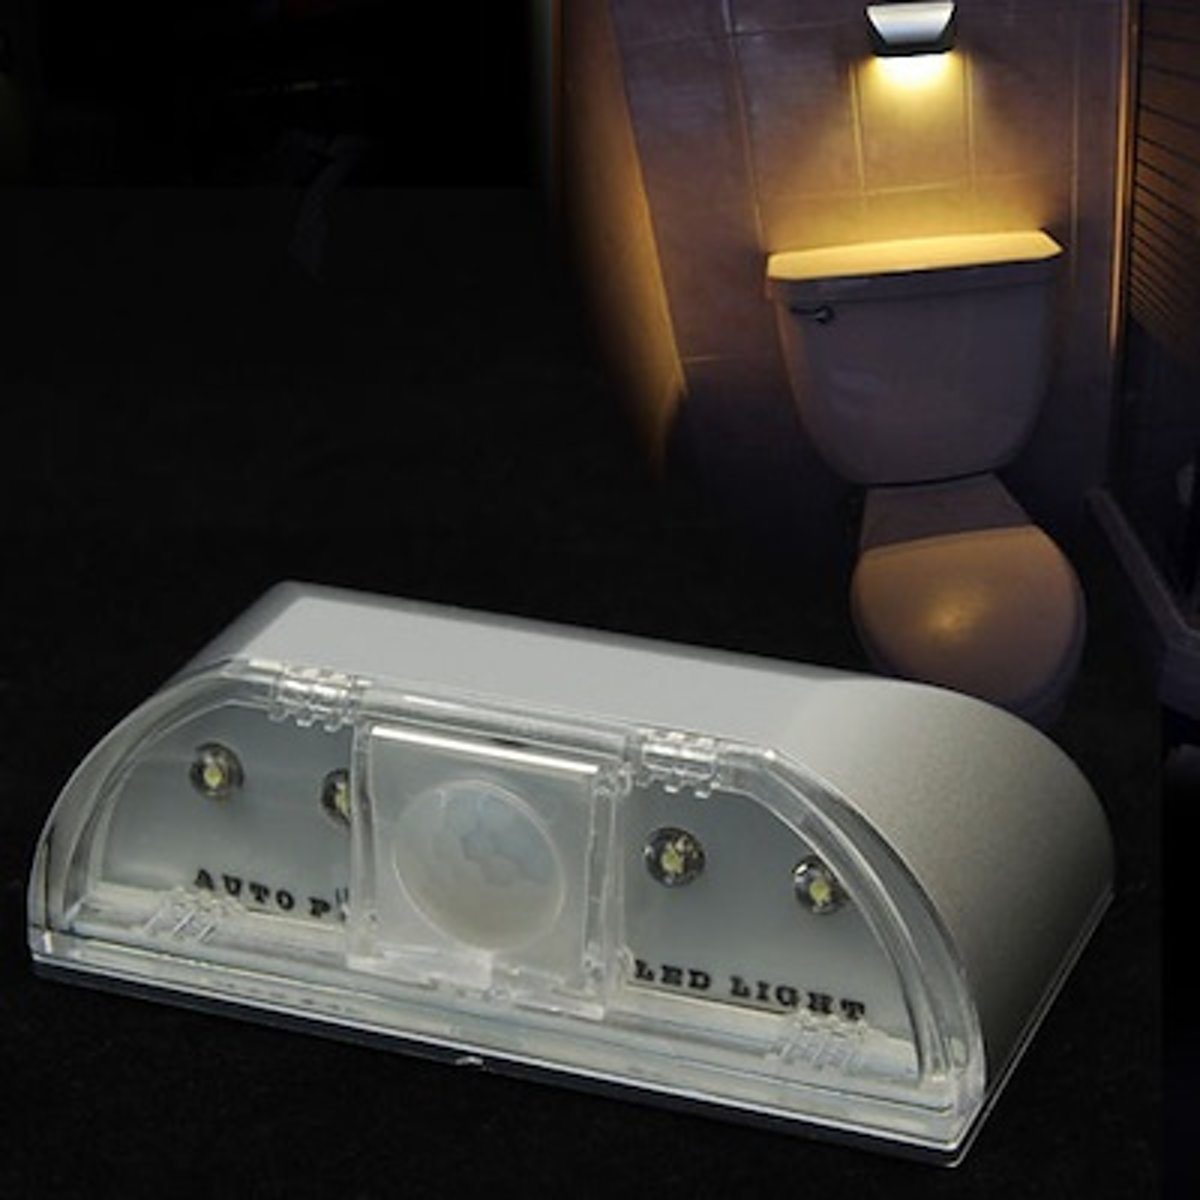 Led Sensor Lamp - Compacte design - 2x LED Warm Witte Licht - Bewegingssensor Tot 3 Meter - Motion Detection kopen